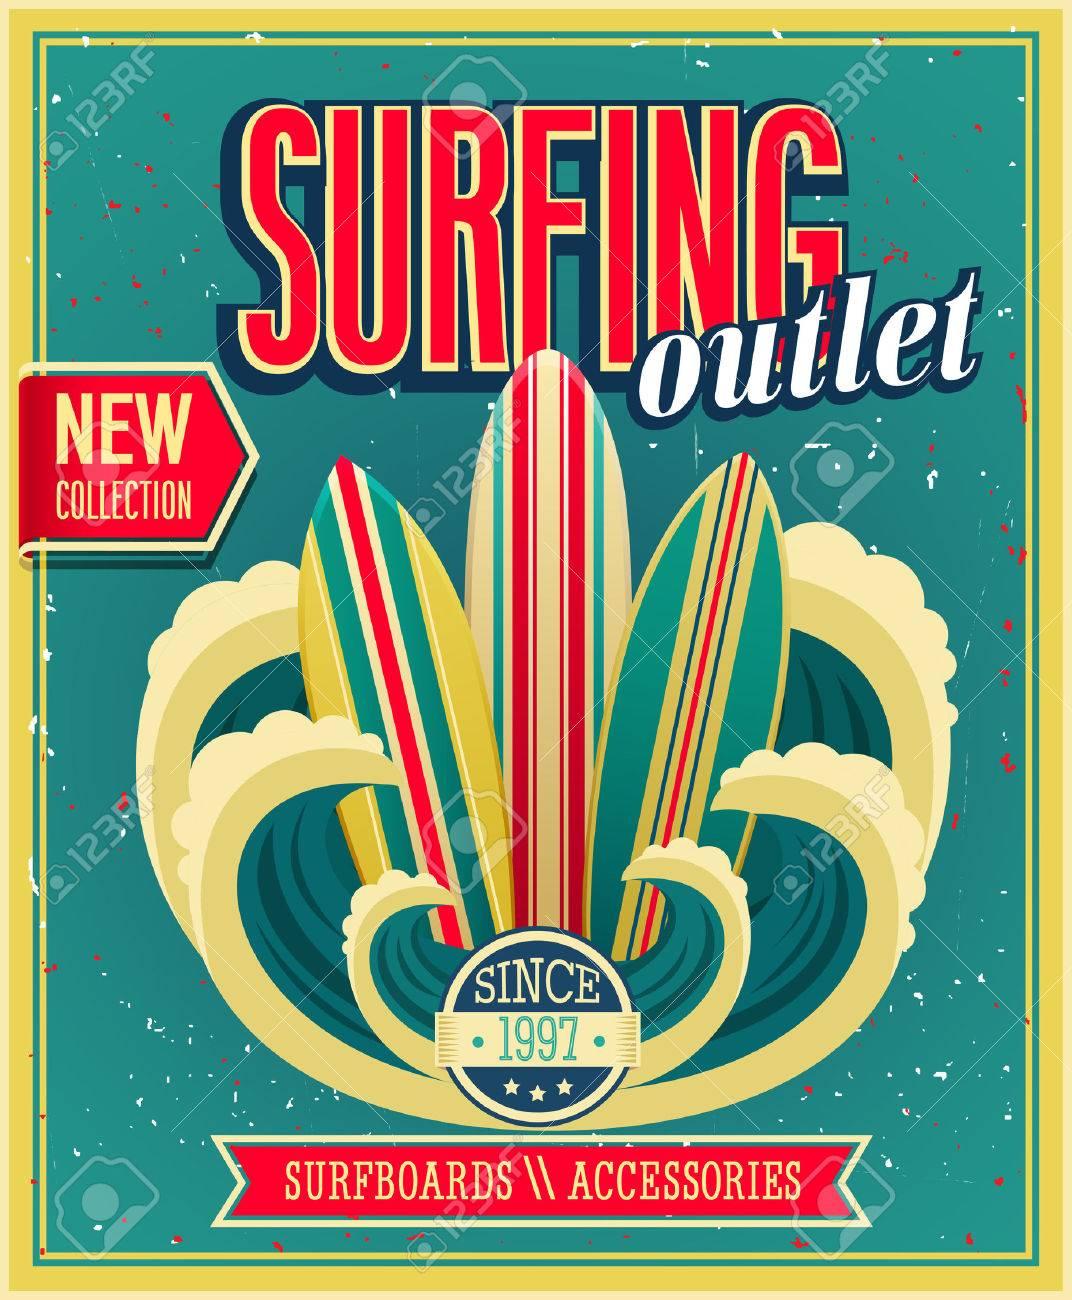 Surfing otlet. Vector ilustration. - 26935281